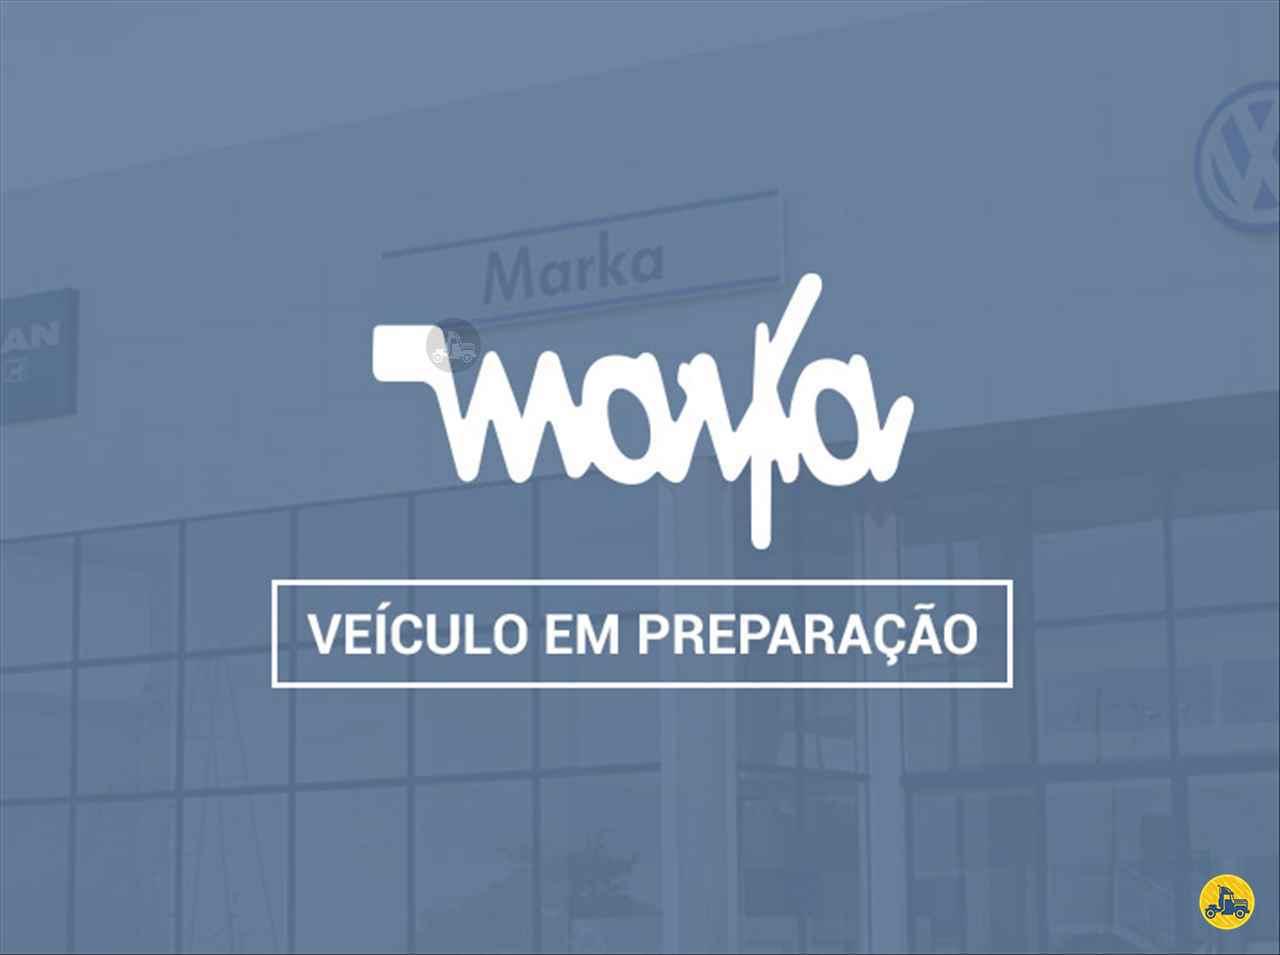 CAMINHAO VOLKSWAGEN VW 18310 Cavalo Mecânico Toco 4x2 Marka Veículos - VW JAU SÃO PAULO SP